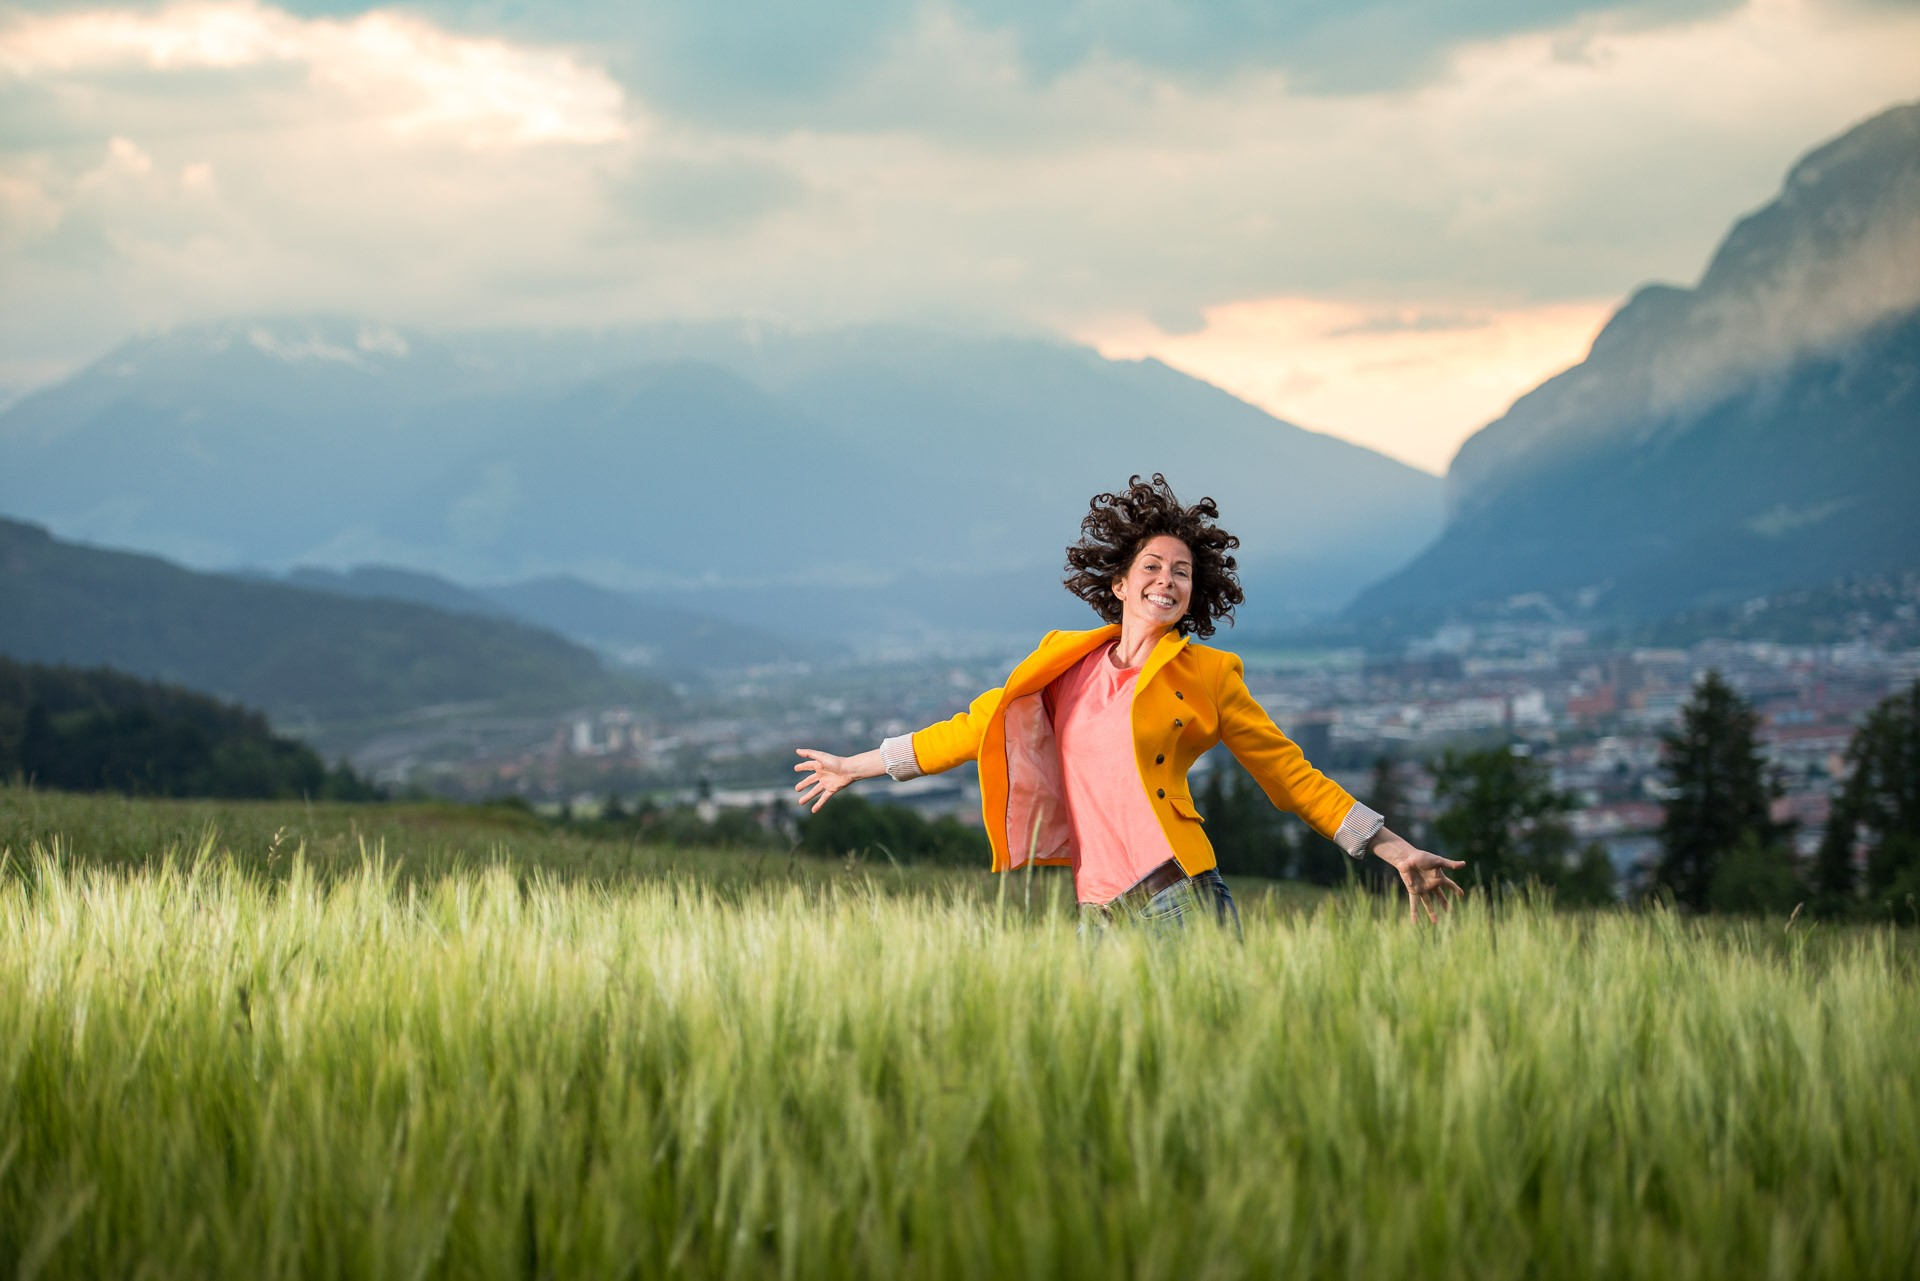 portraitfotos-portraitfotografie-outdoorshooting-abendlicht-innsbruck-fotografin-tirol